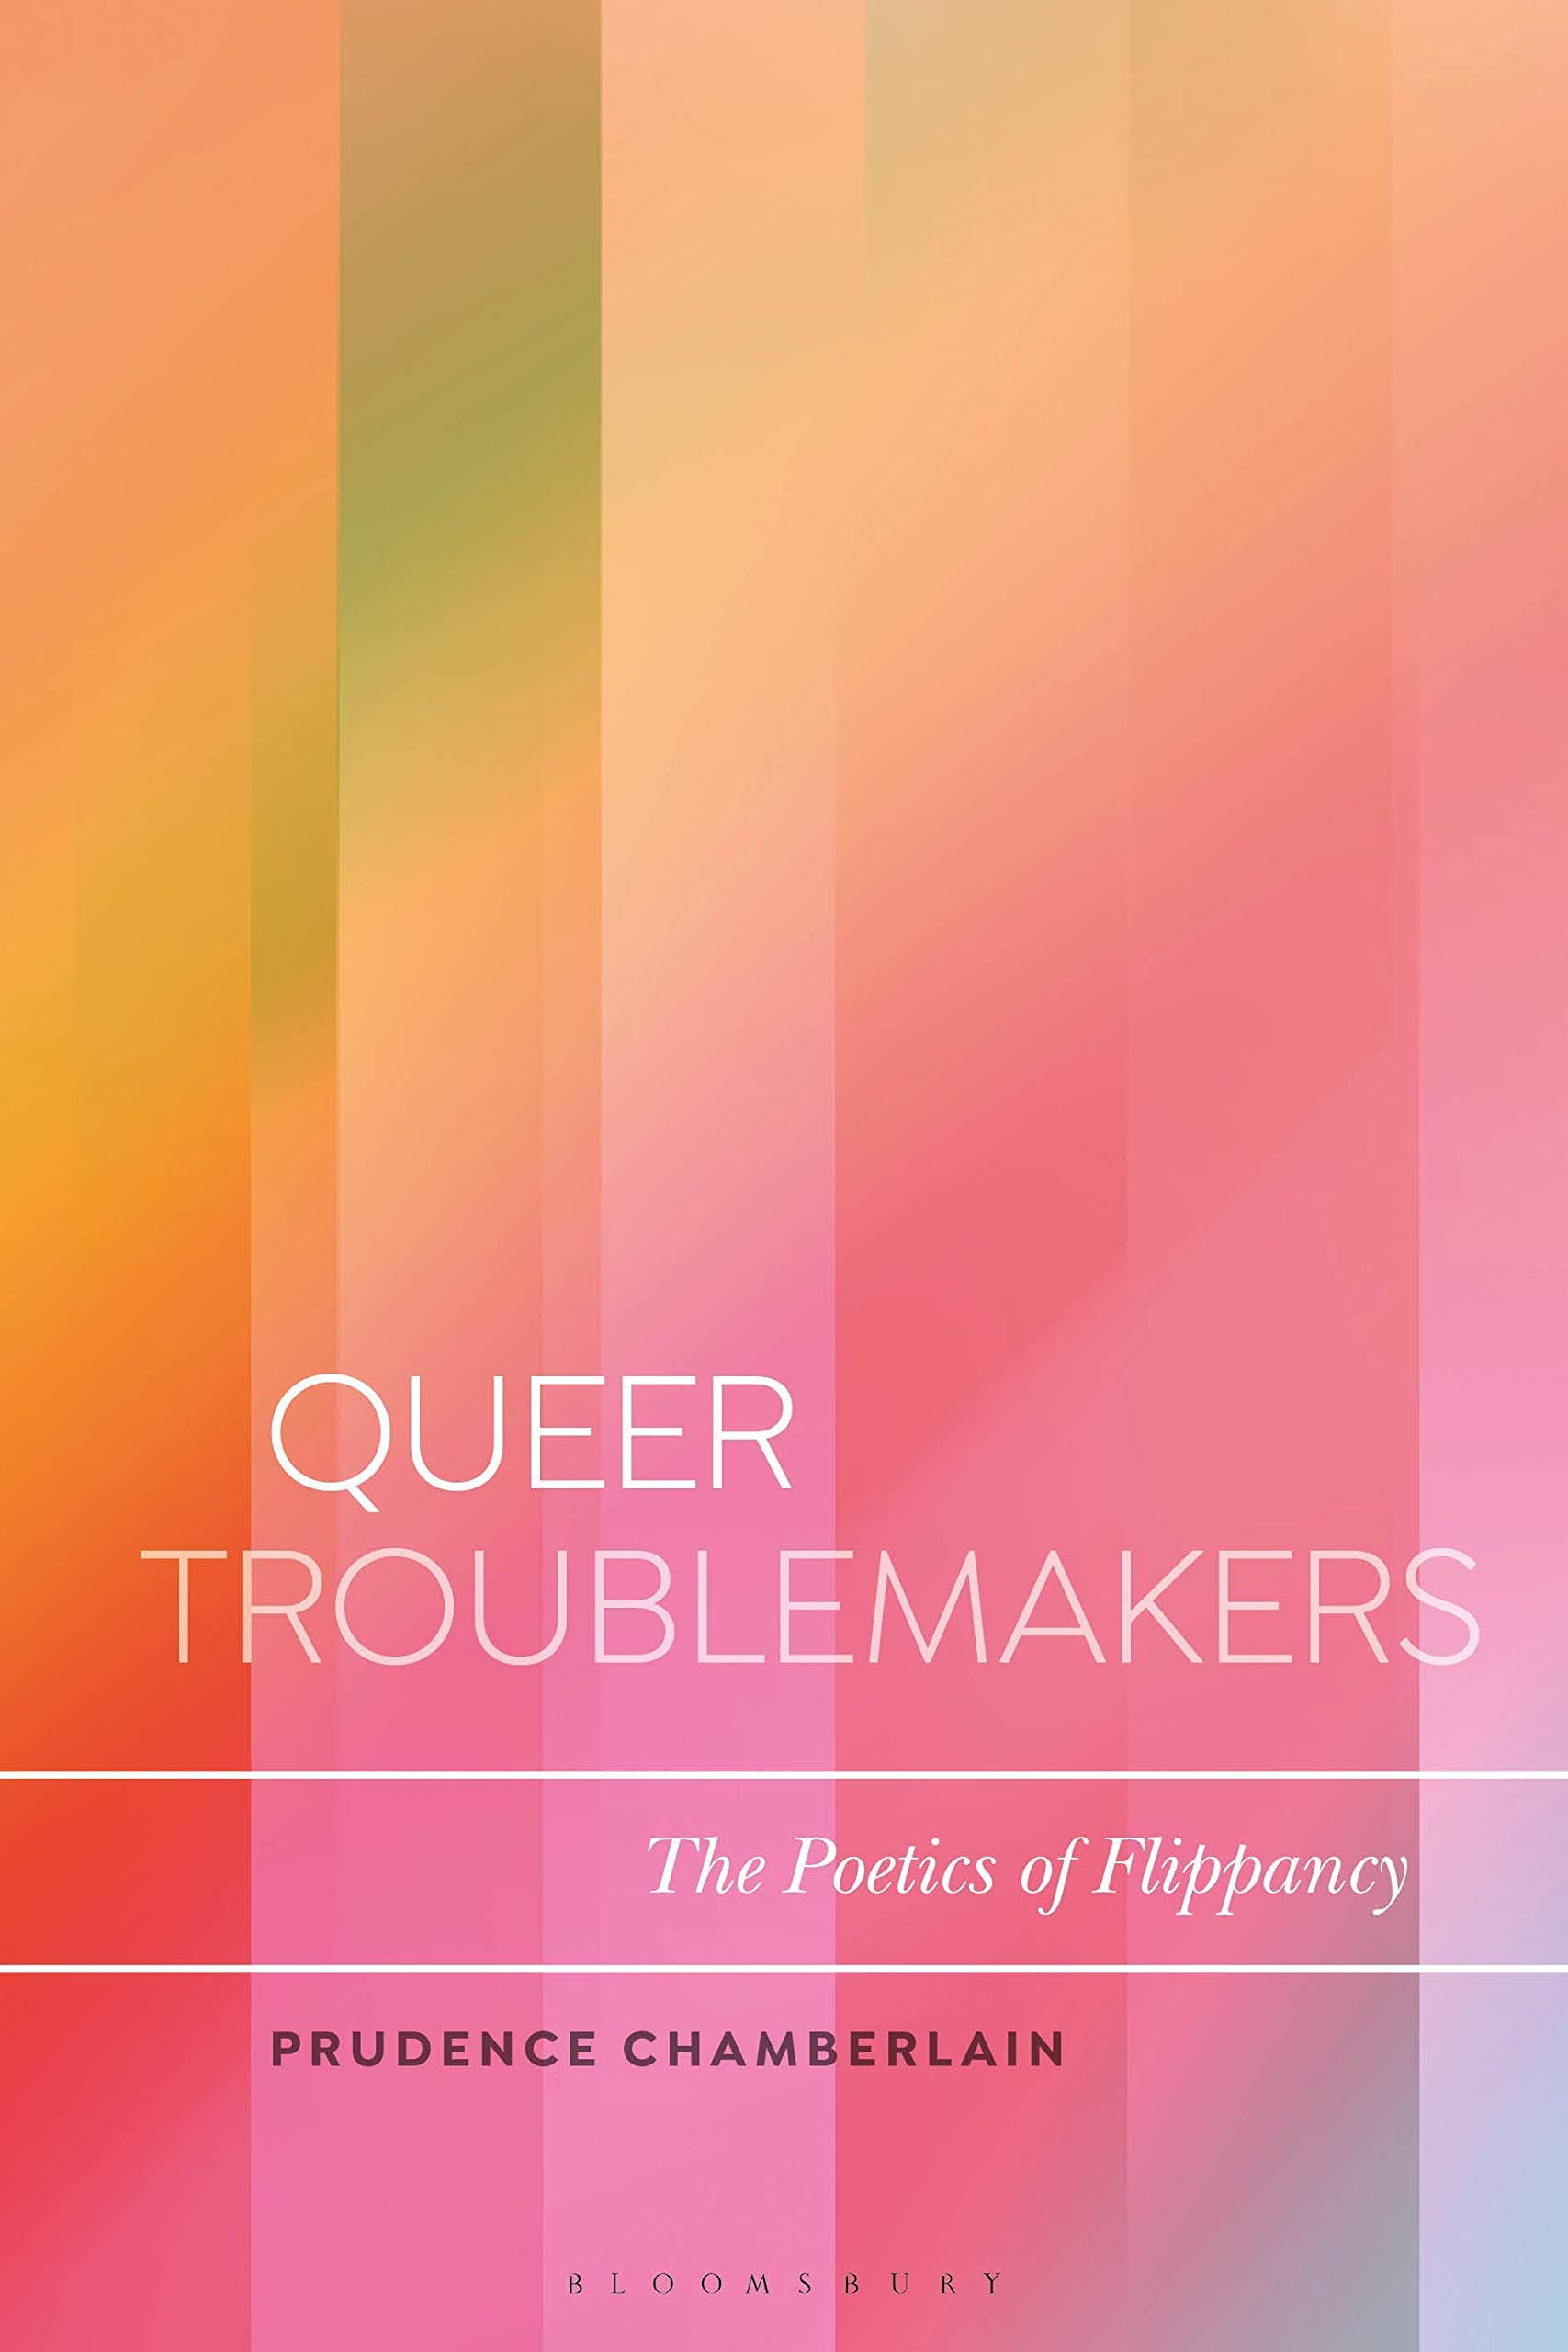 Queer Troublemakers: The Poetics of Flippancy (Bloomsbury Studies in Critical Poetics) by Bloomsbury Academic